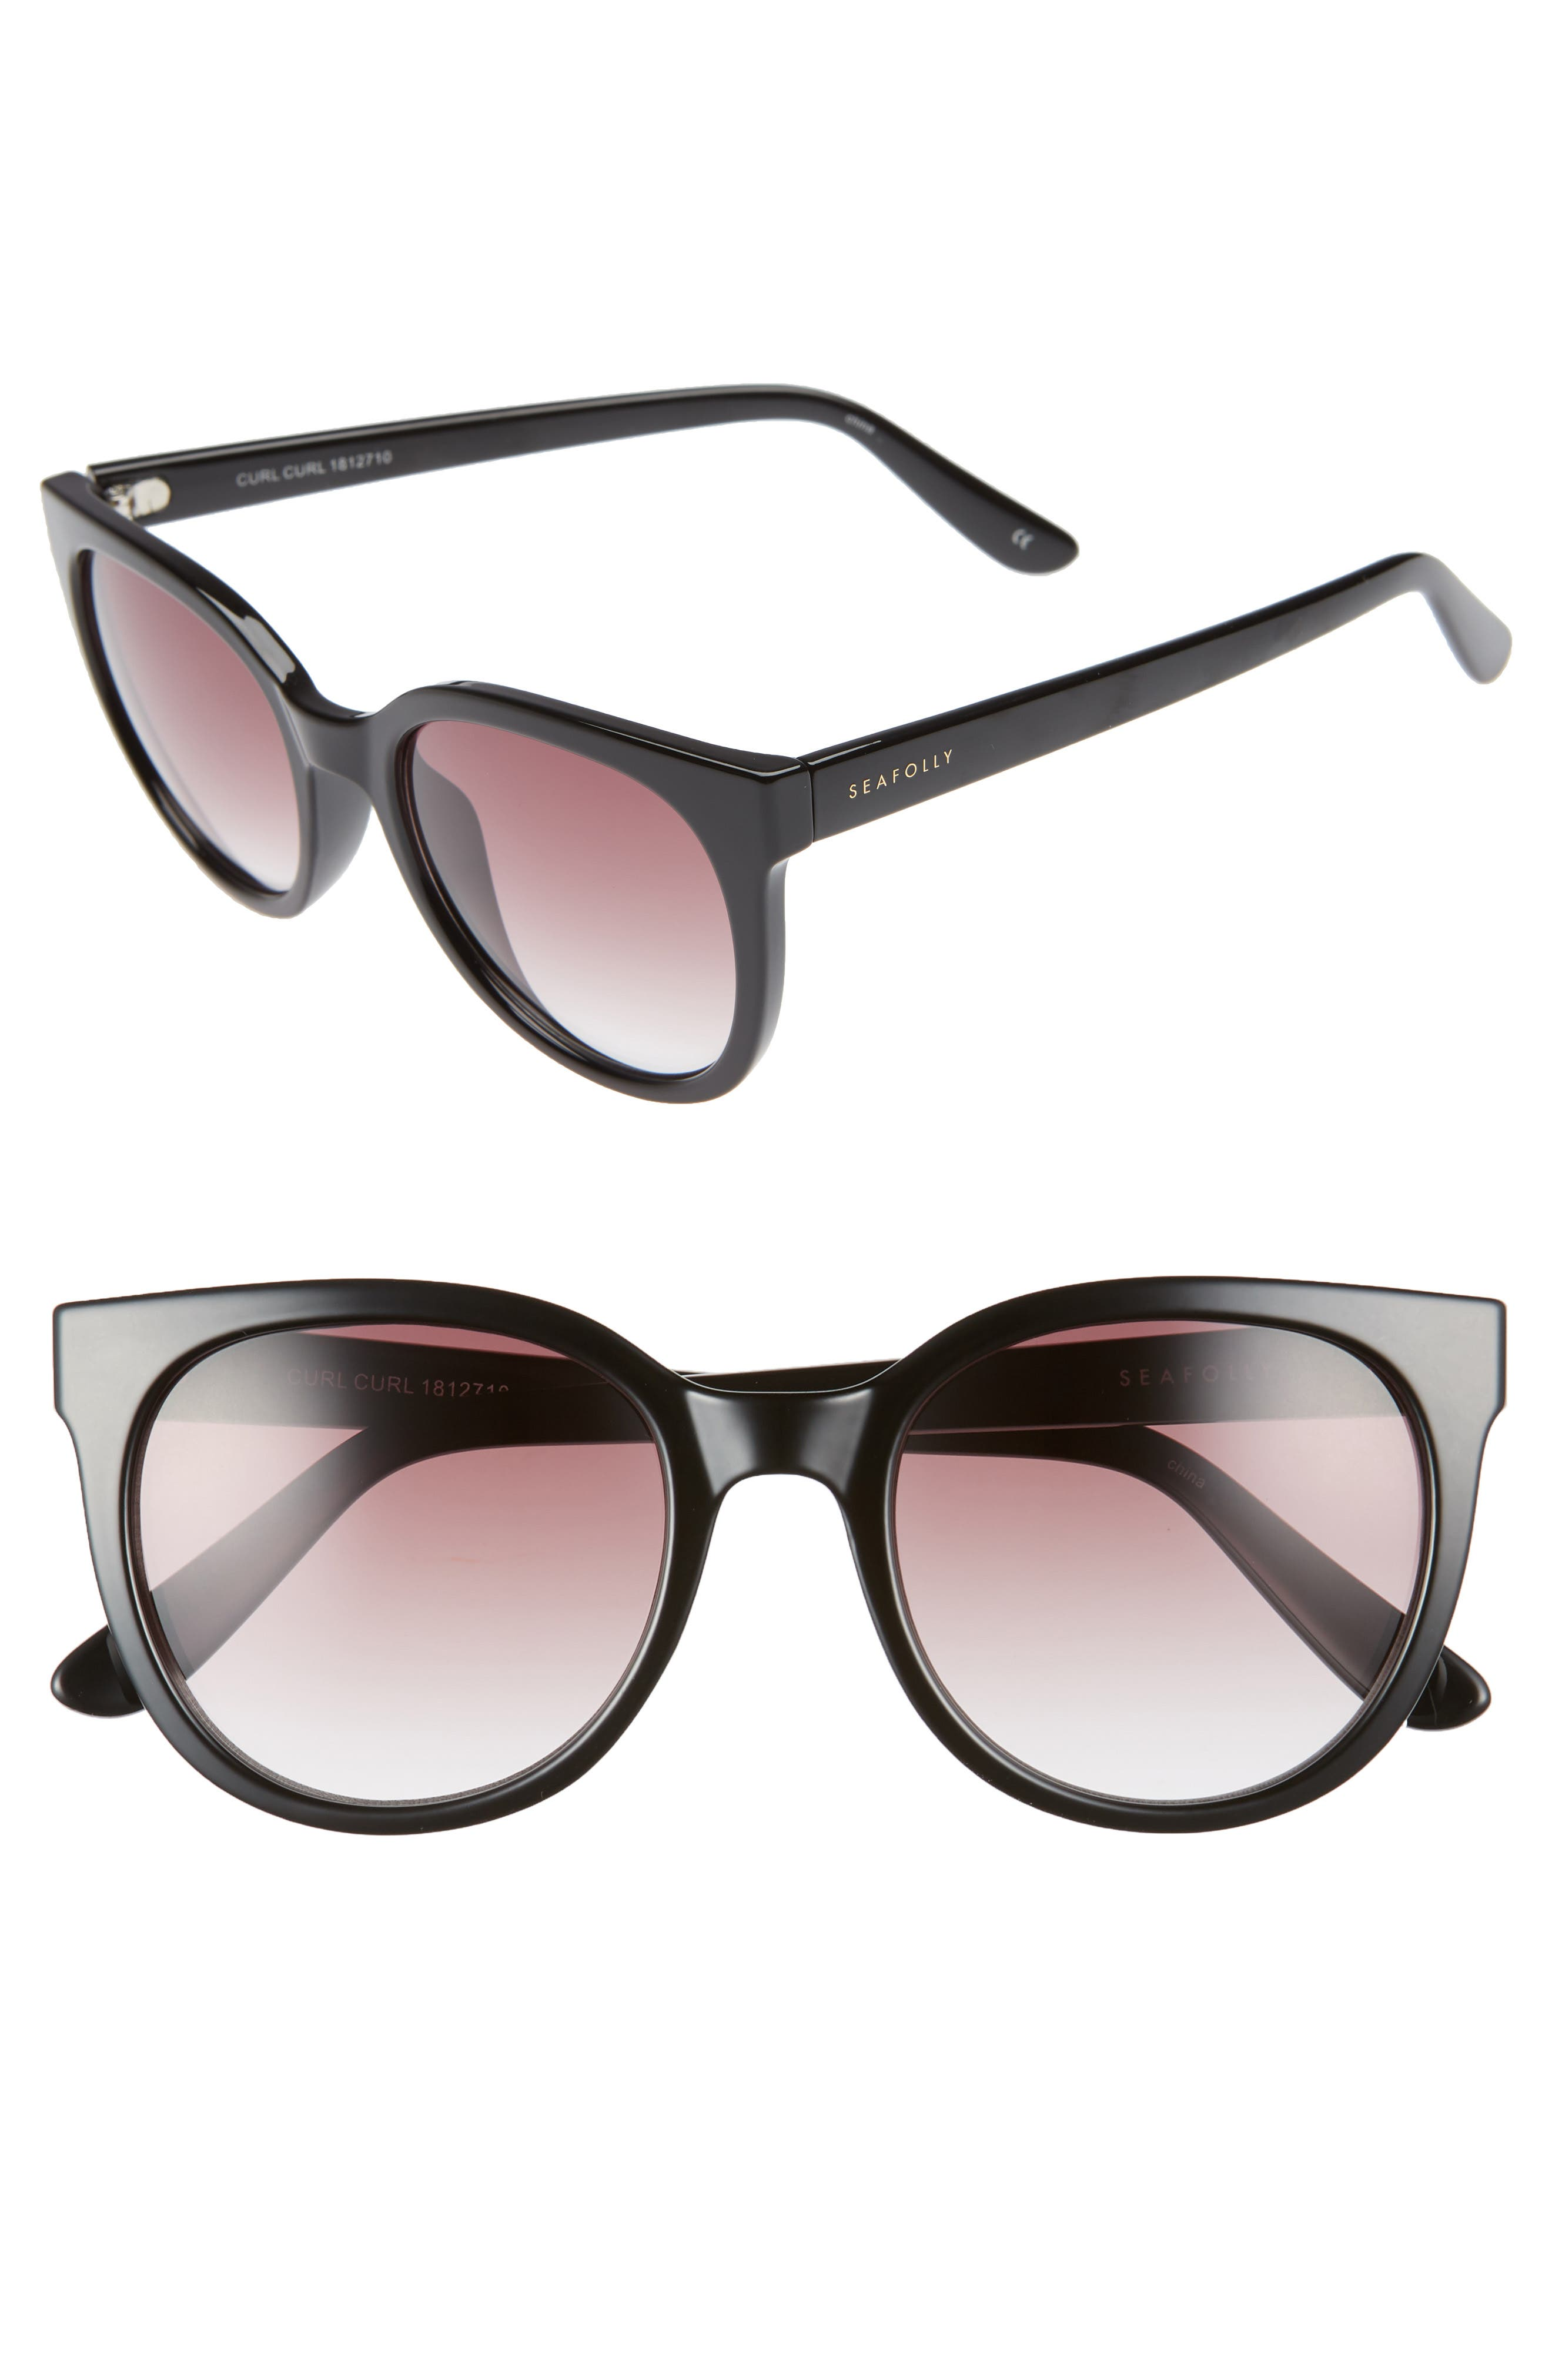 Seafolly Curl Curl 5m Sunglasses - Black/ Warm Smoke